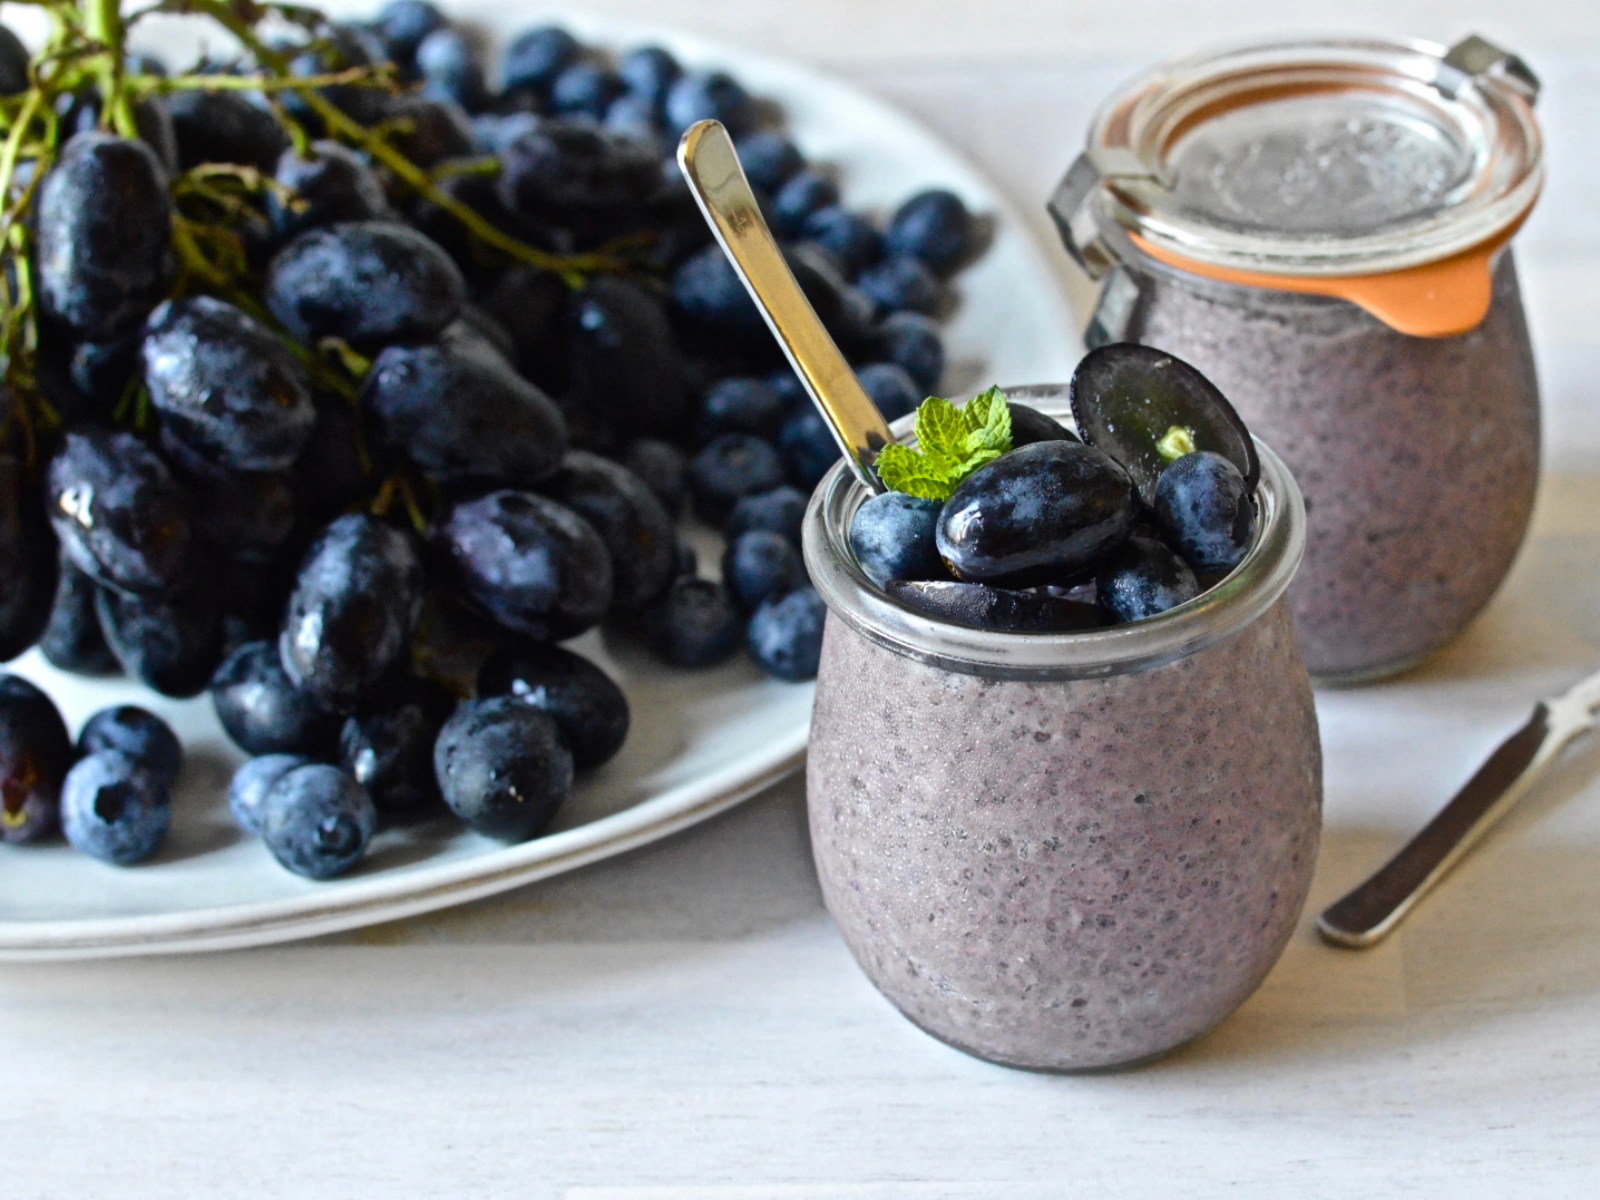 Vegan Black Magic Grape and Blueberry Chia Pudding